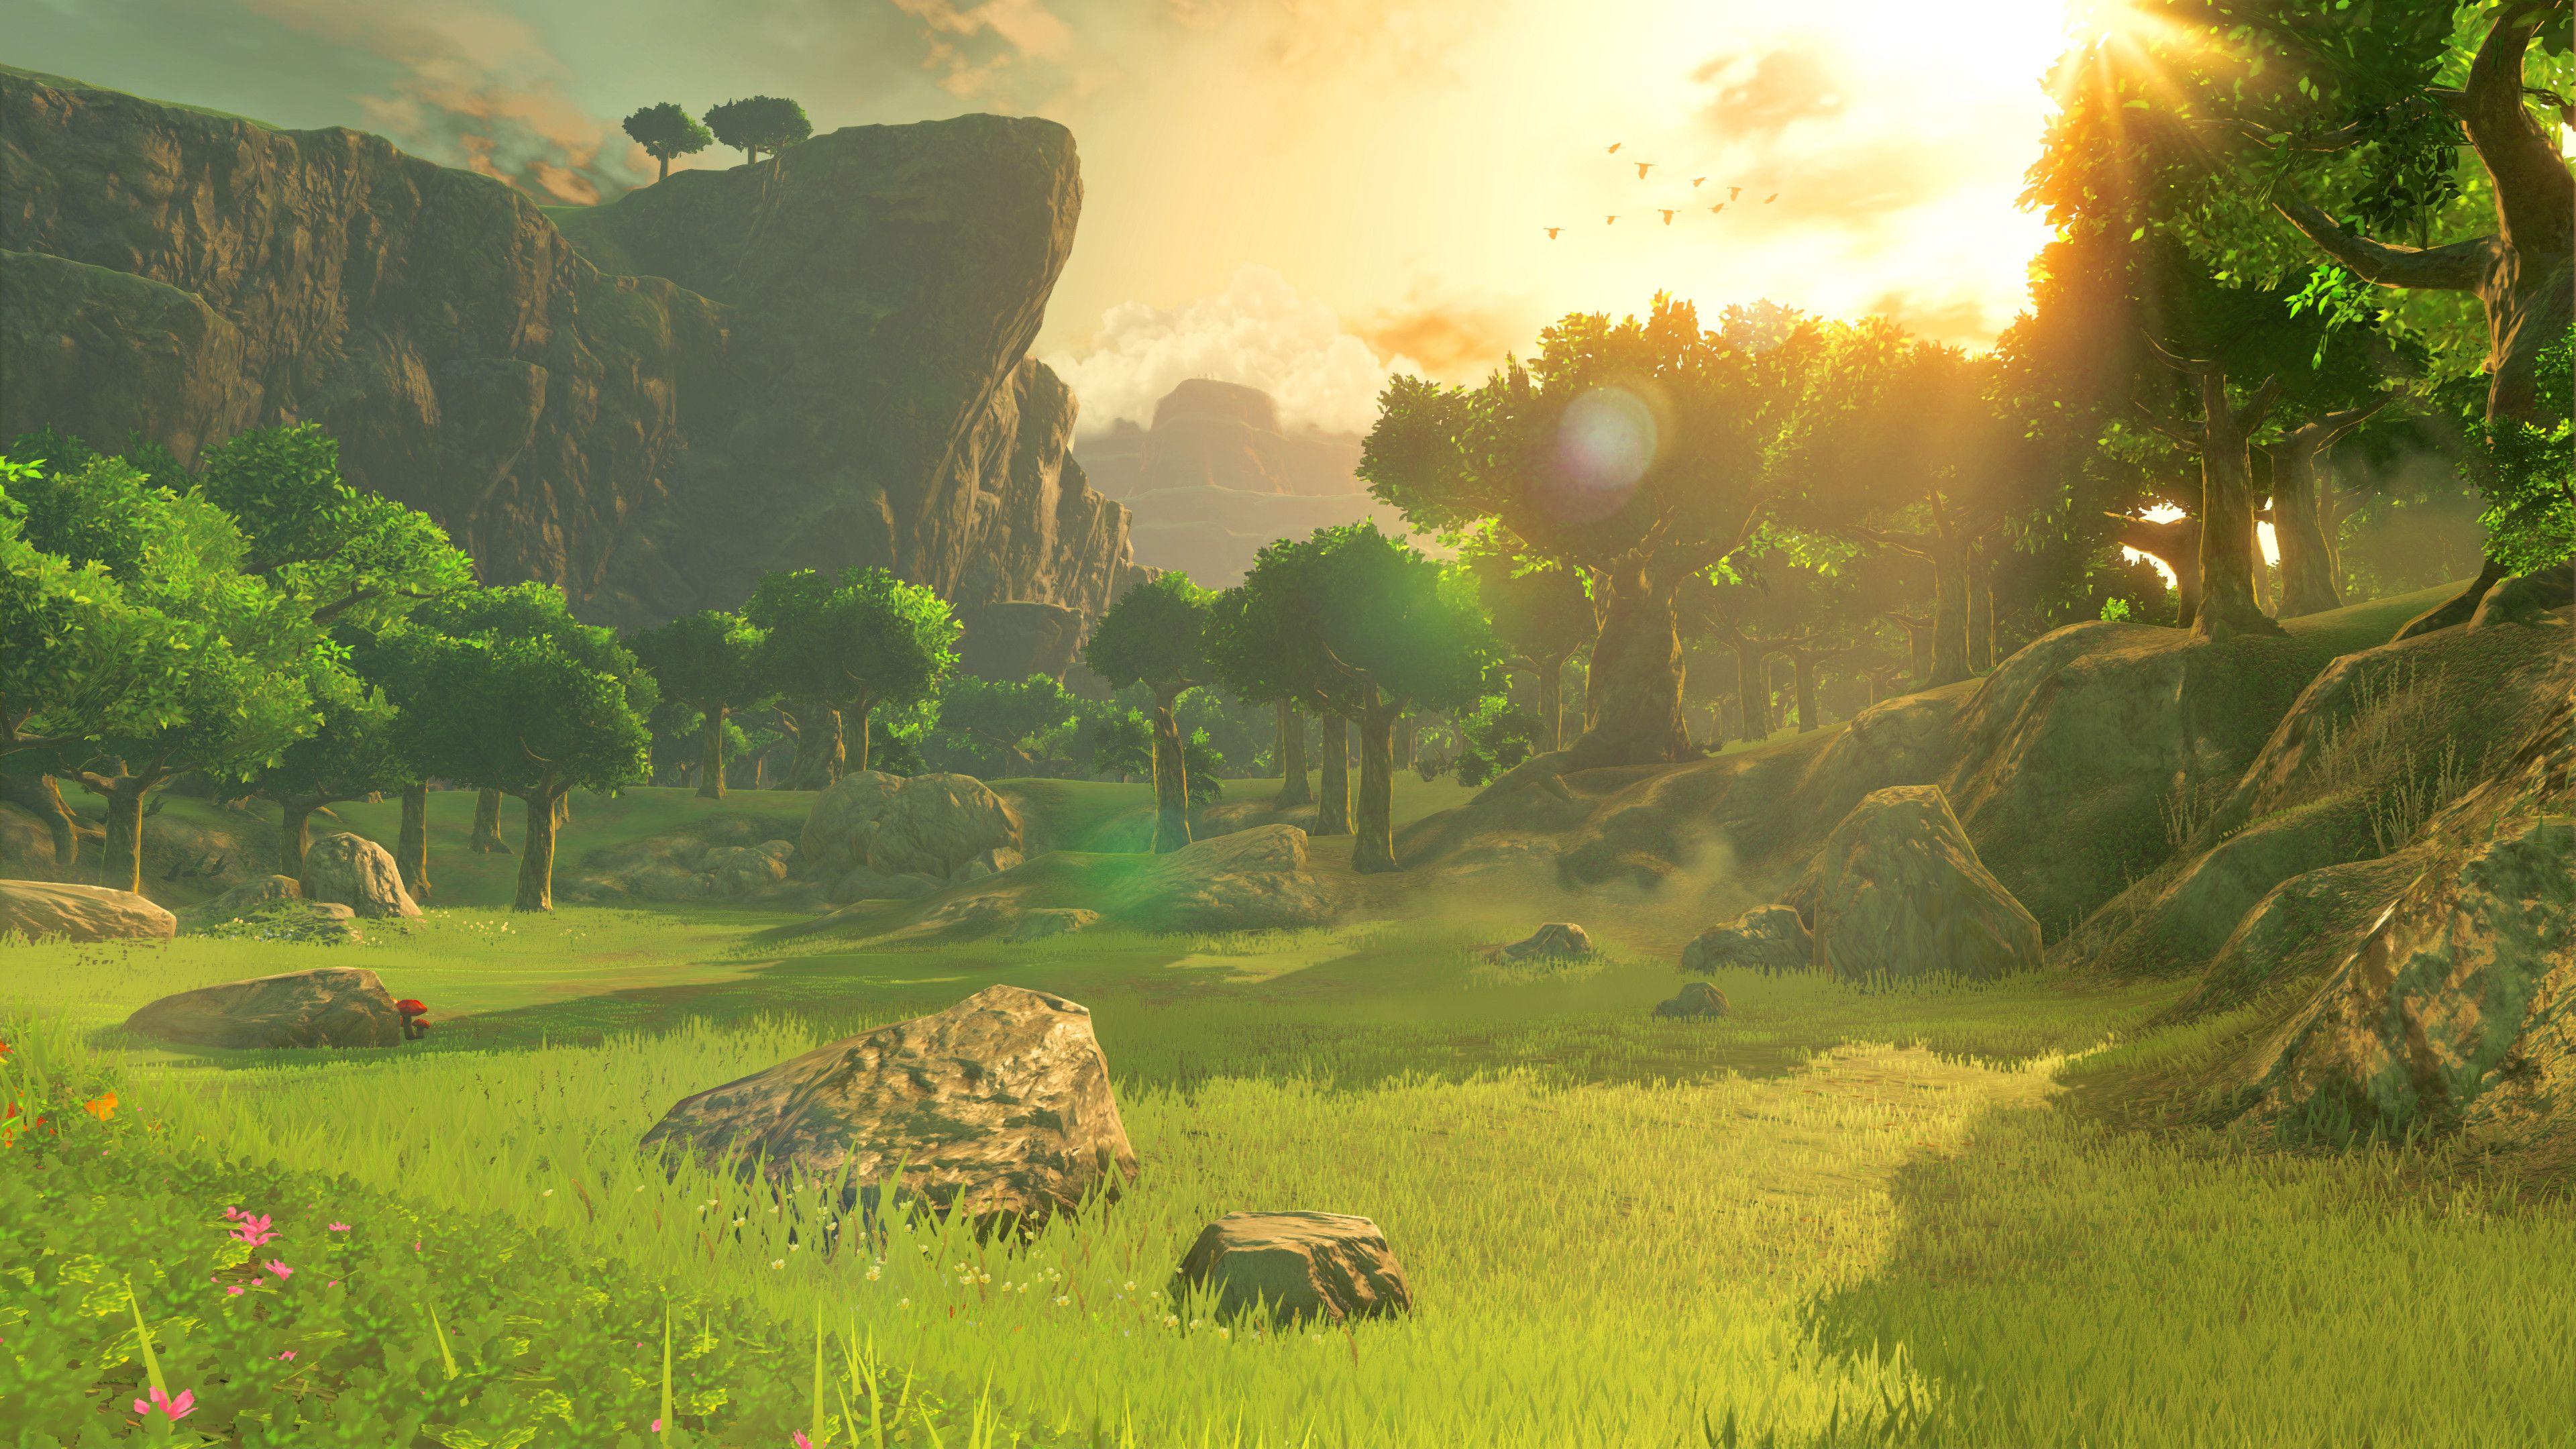 The Legend Of Zelda Breath Of The Wild Wallpaper Pack Fantasy Landscape Anime Scenery Legend Of Zelda Legend of zelda botw wallpaper hd